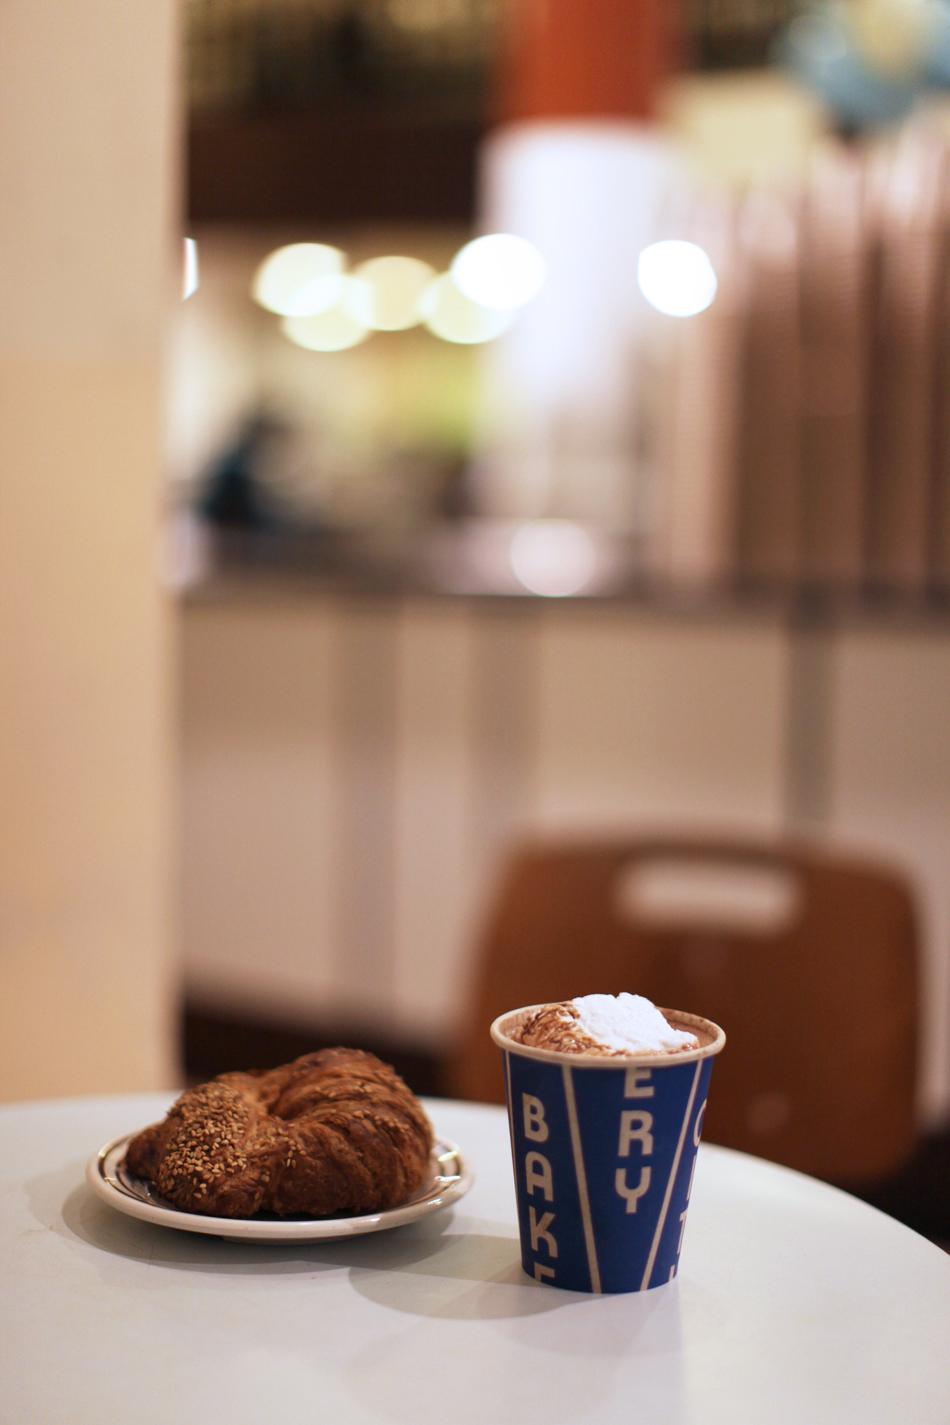 city bakery hot chocolate festival new york city